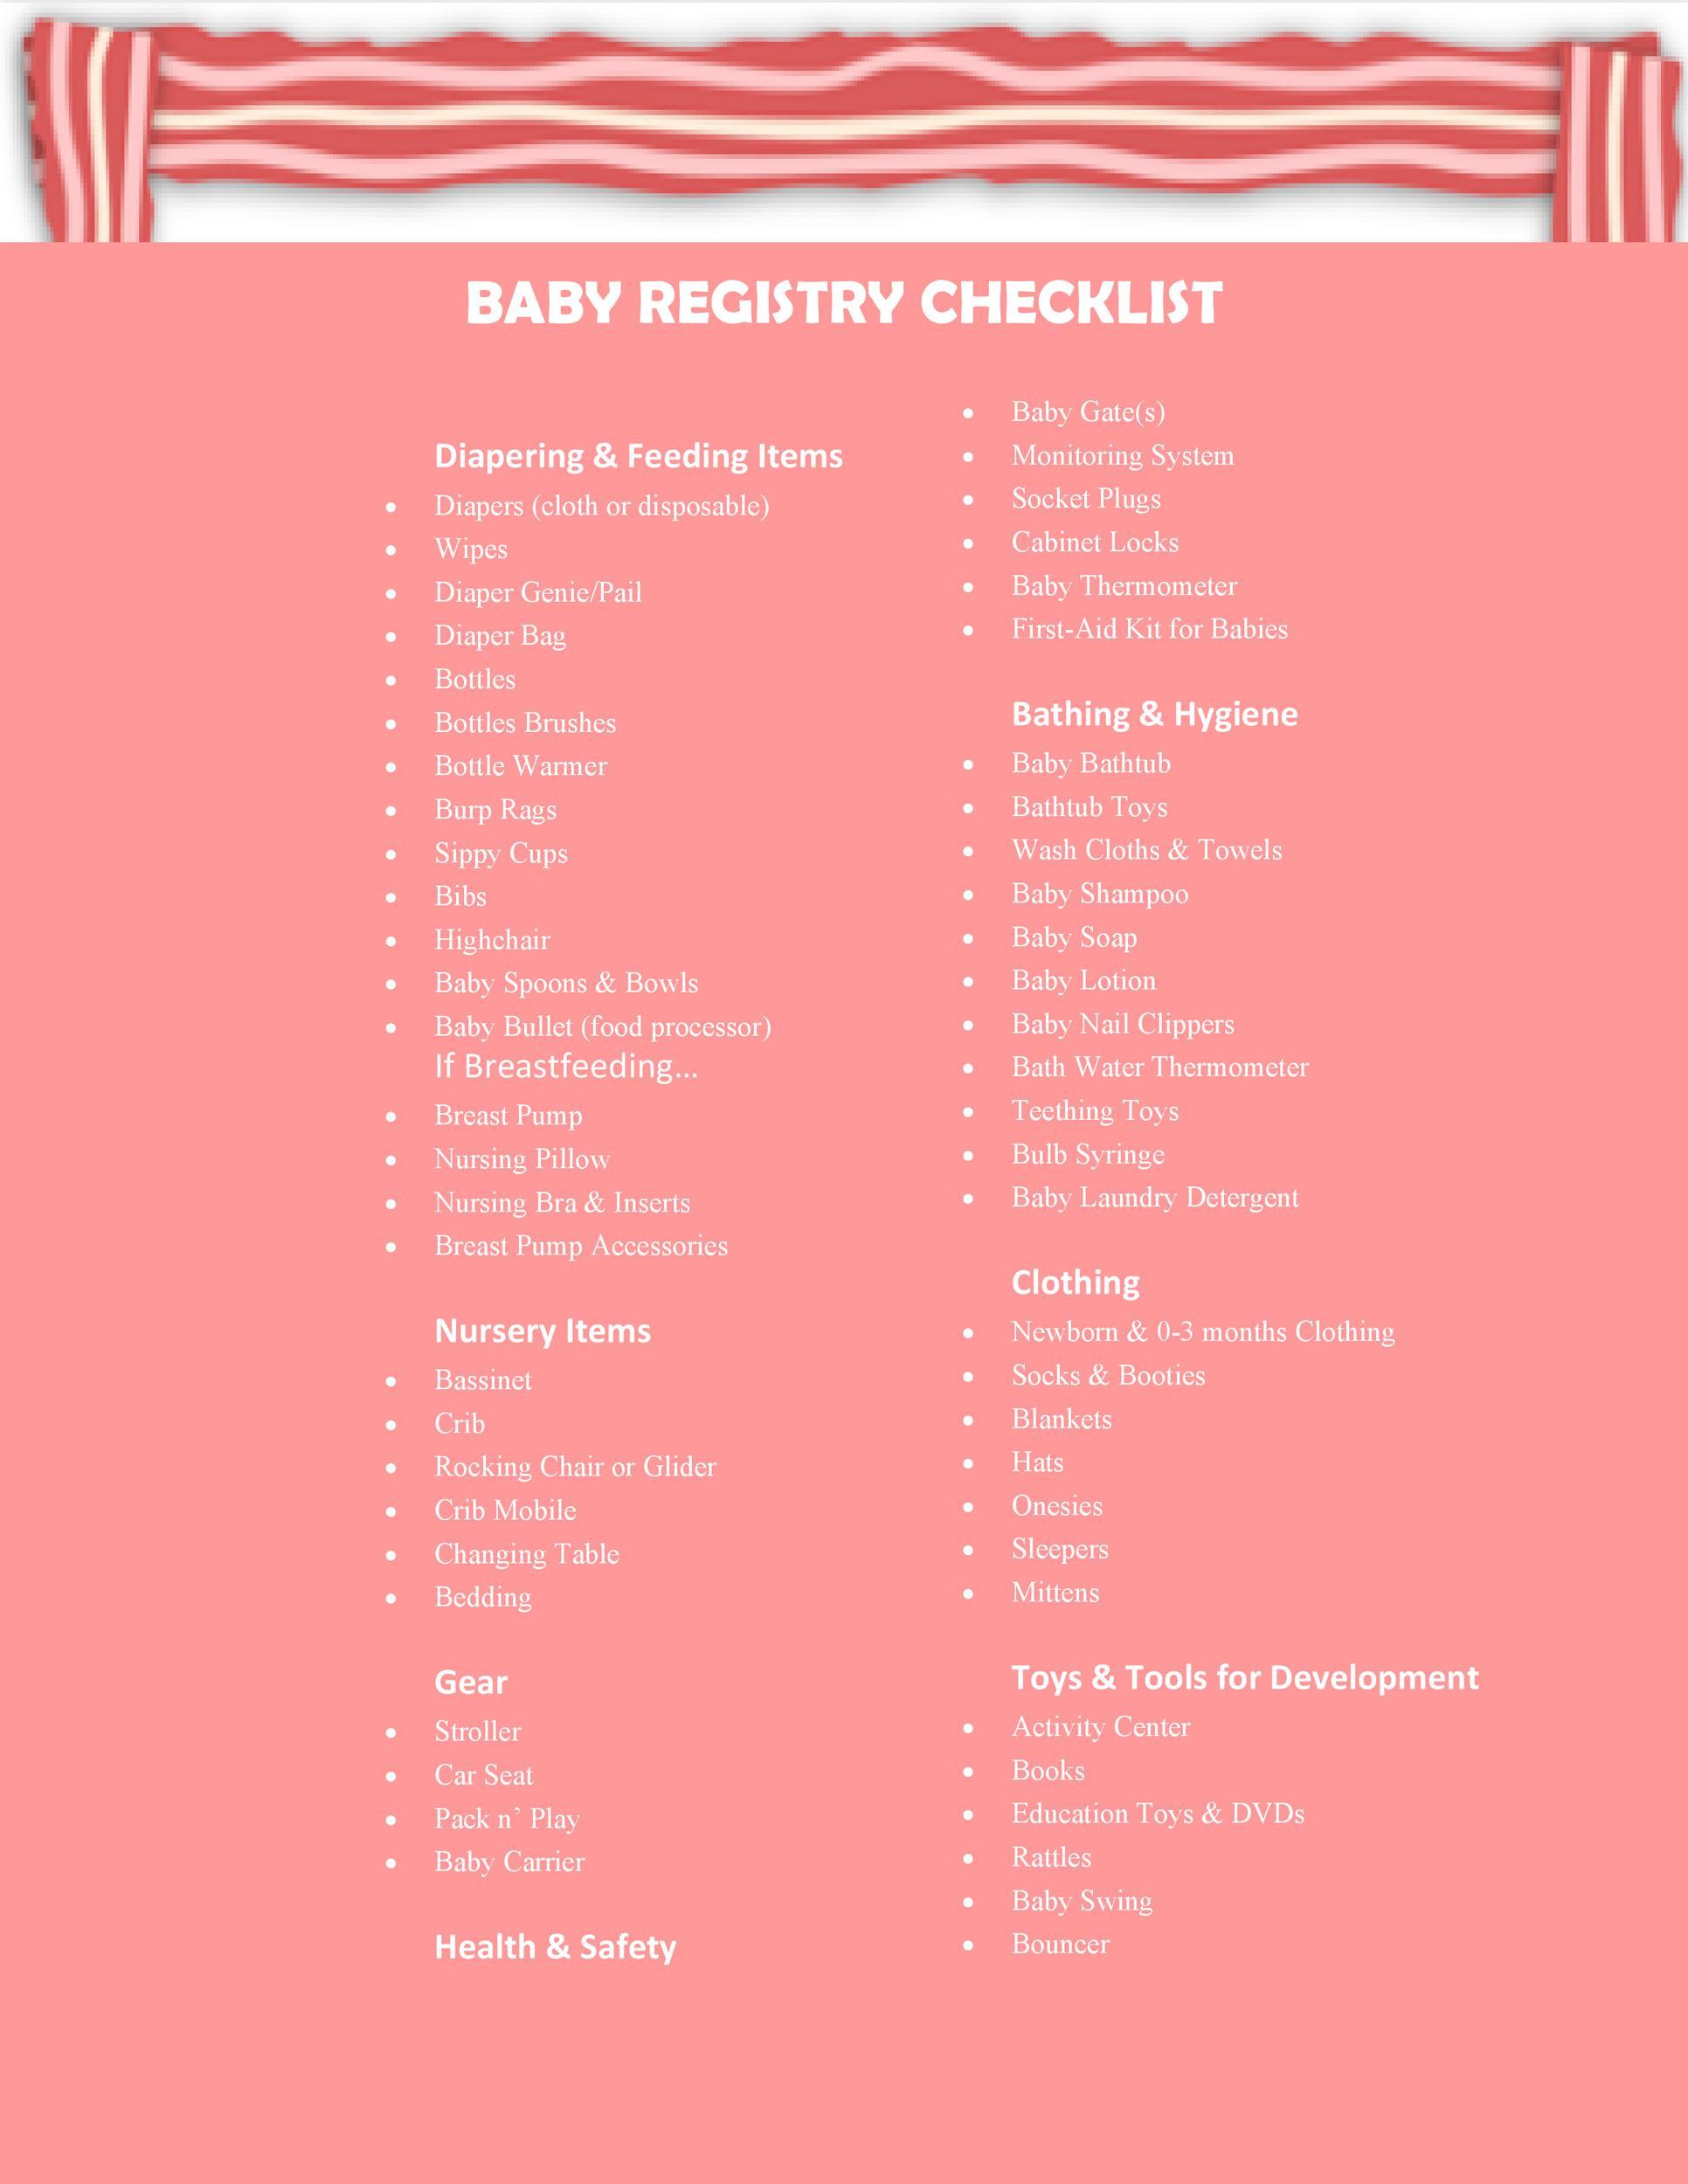 30+ Baby Registry Checklists (Newborn Baby Checklists) ᐅ Template Lab